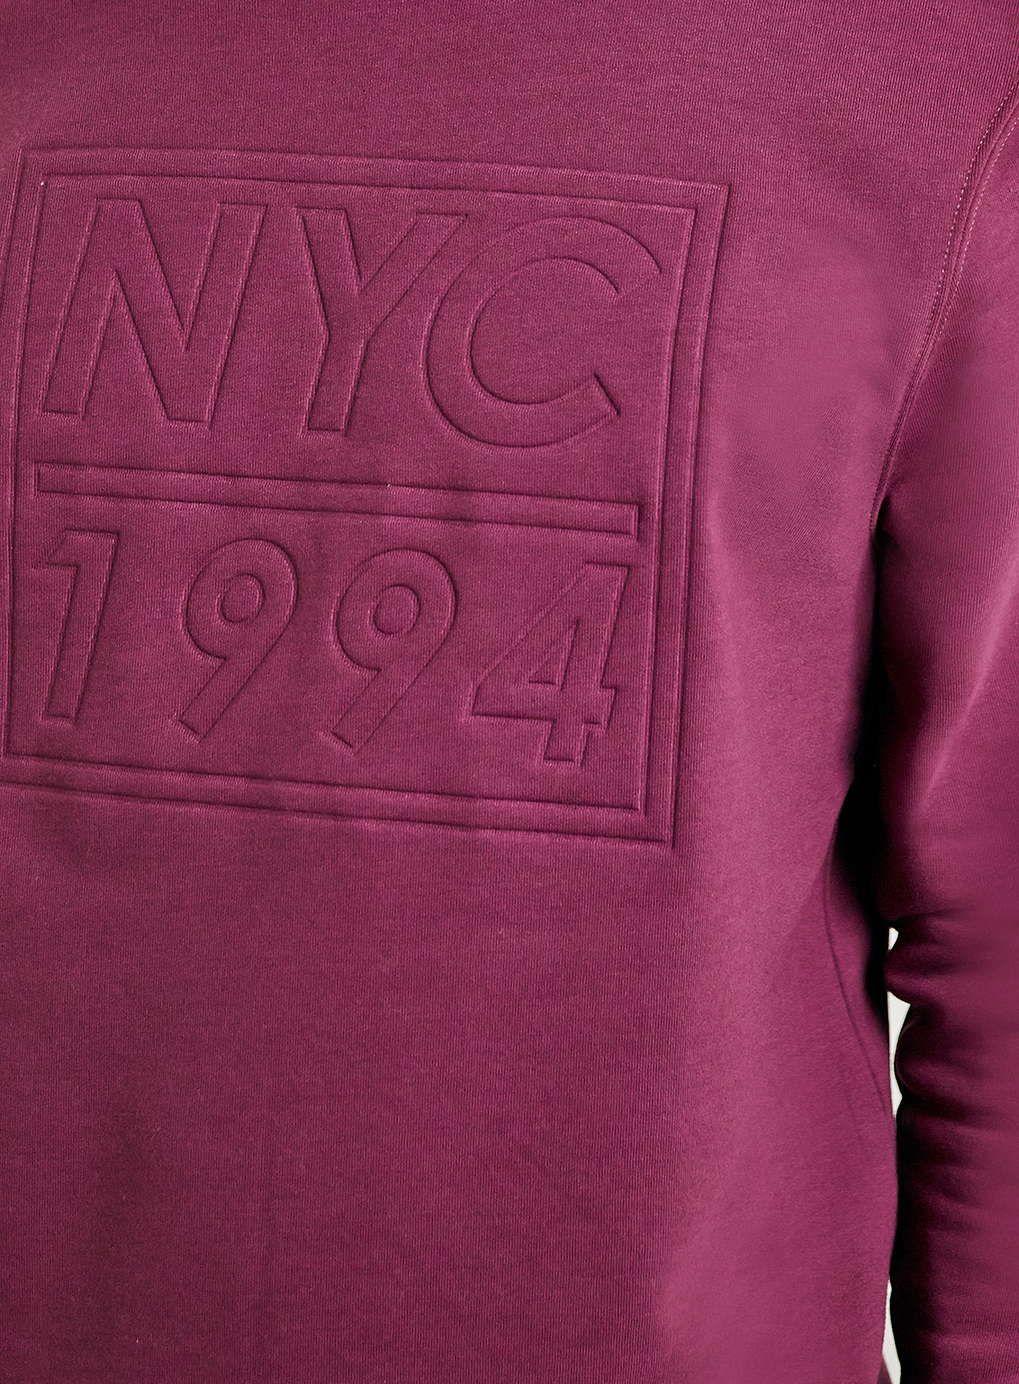 Photo 4 of Burgundy 1994 Embossed Sweatshirt